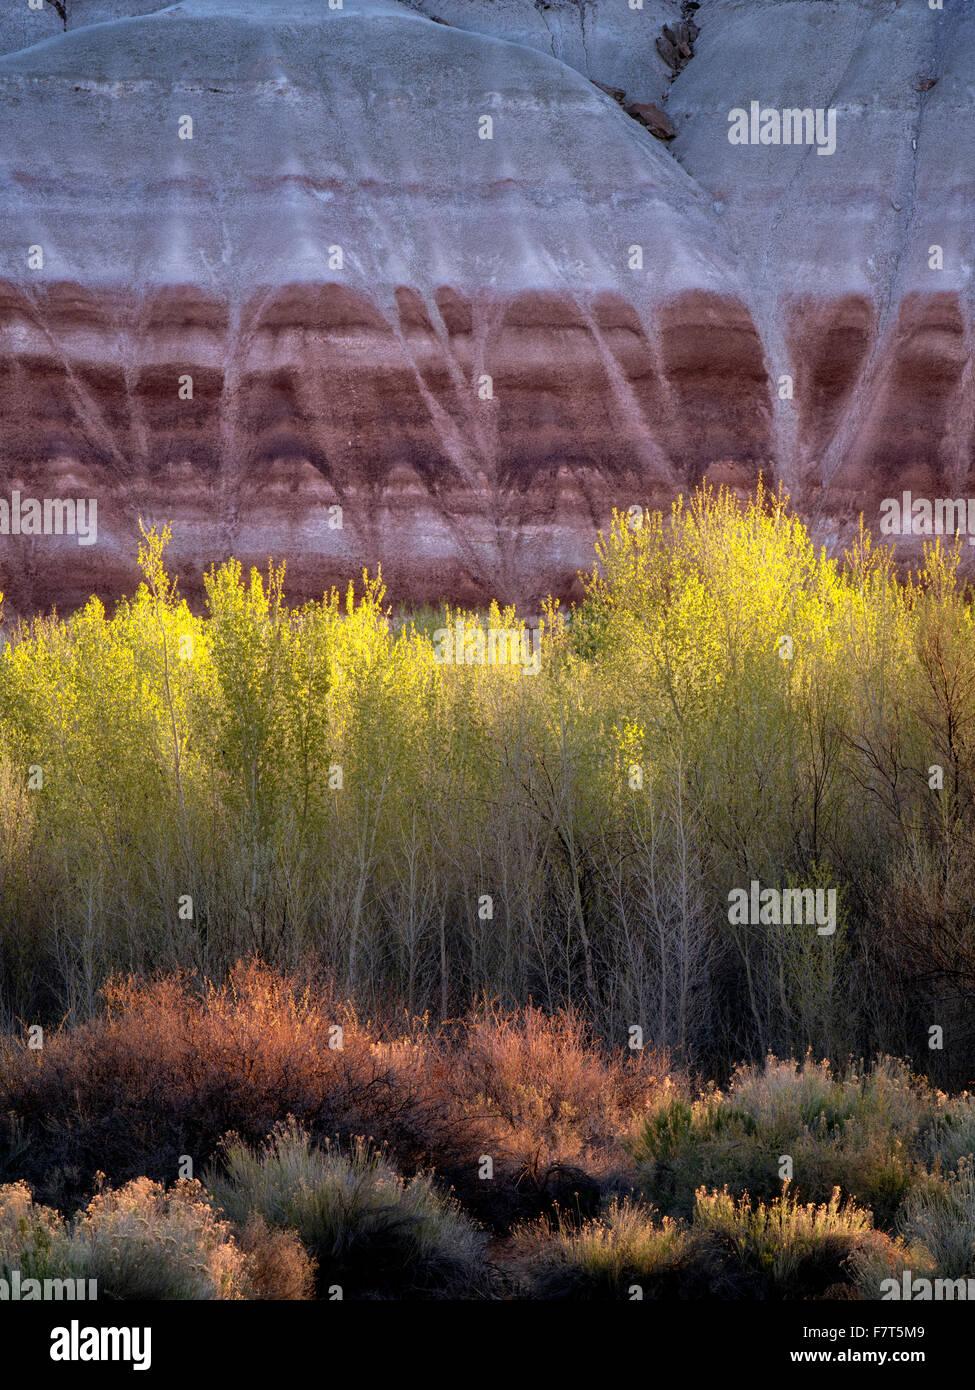 Pappeln und bunten Klippen. Capitol Reef National Park, Utah Stockbild